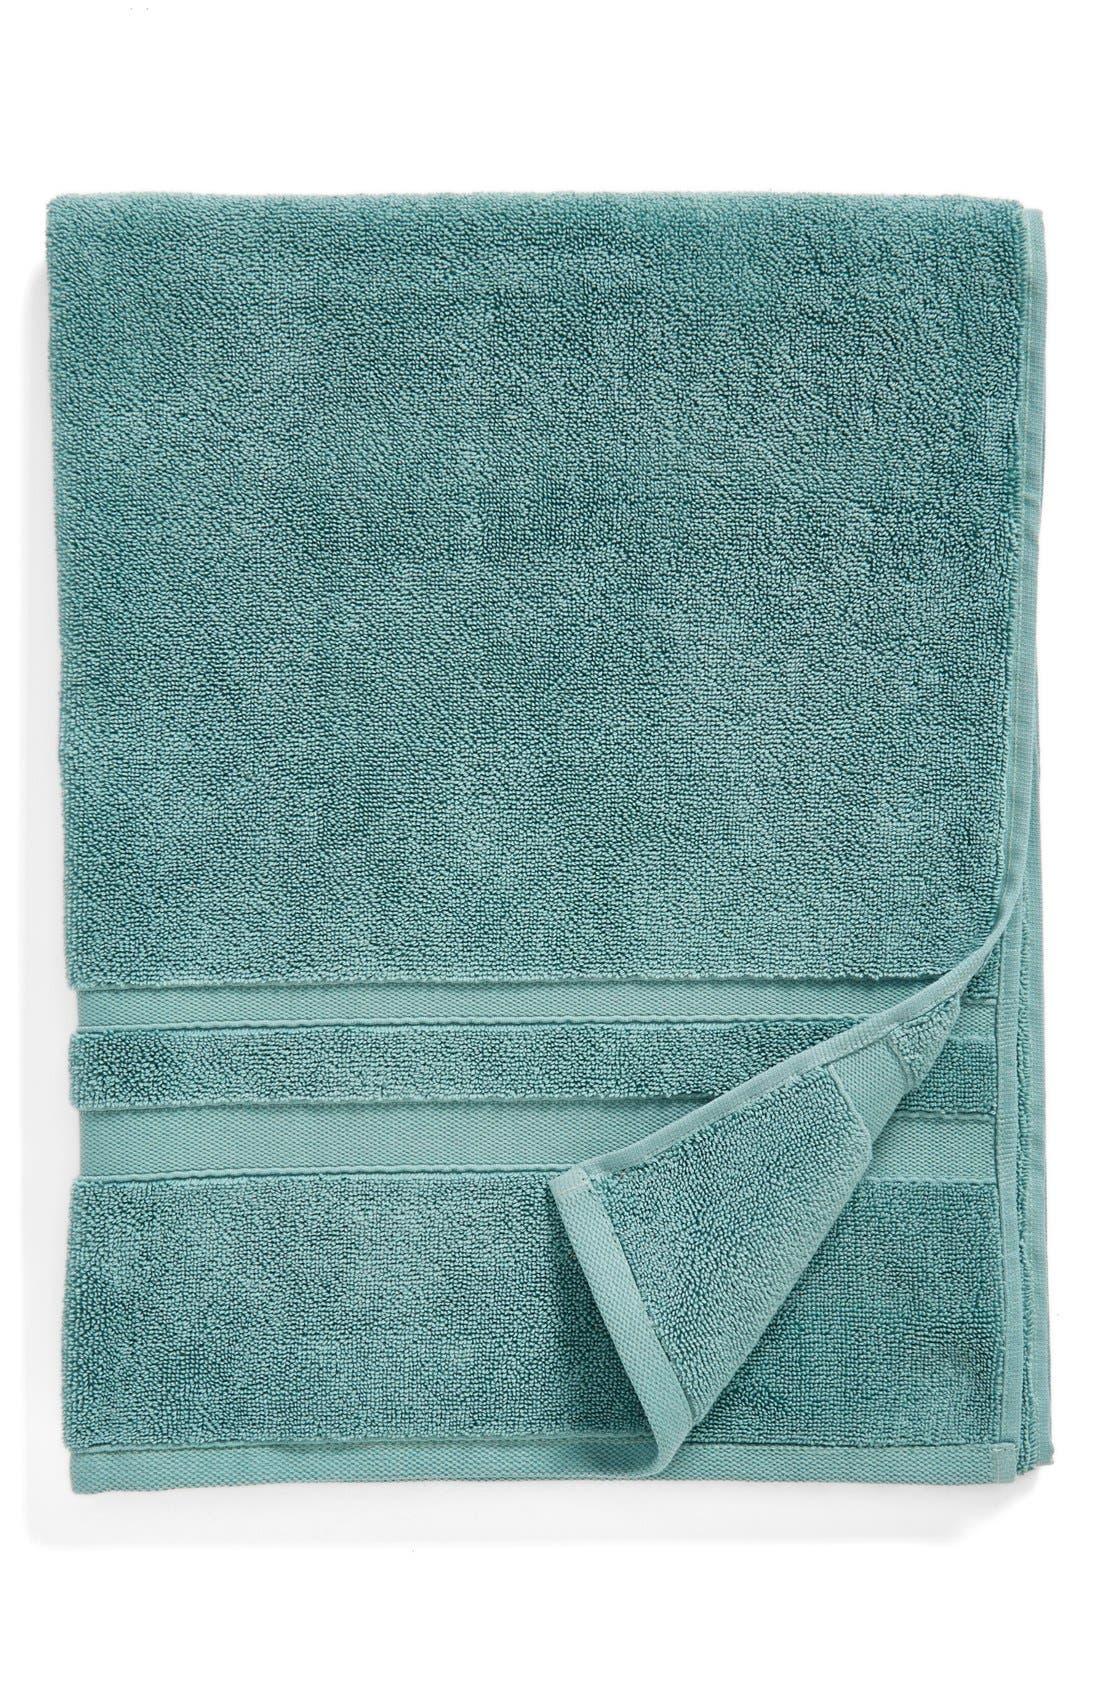 Alternate Image 1 Selected - Waterworks Studio 'Perennial' Turkish Cotton Bath Towel (Online Only)